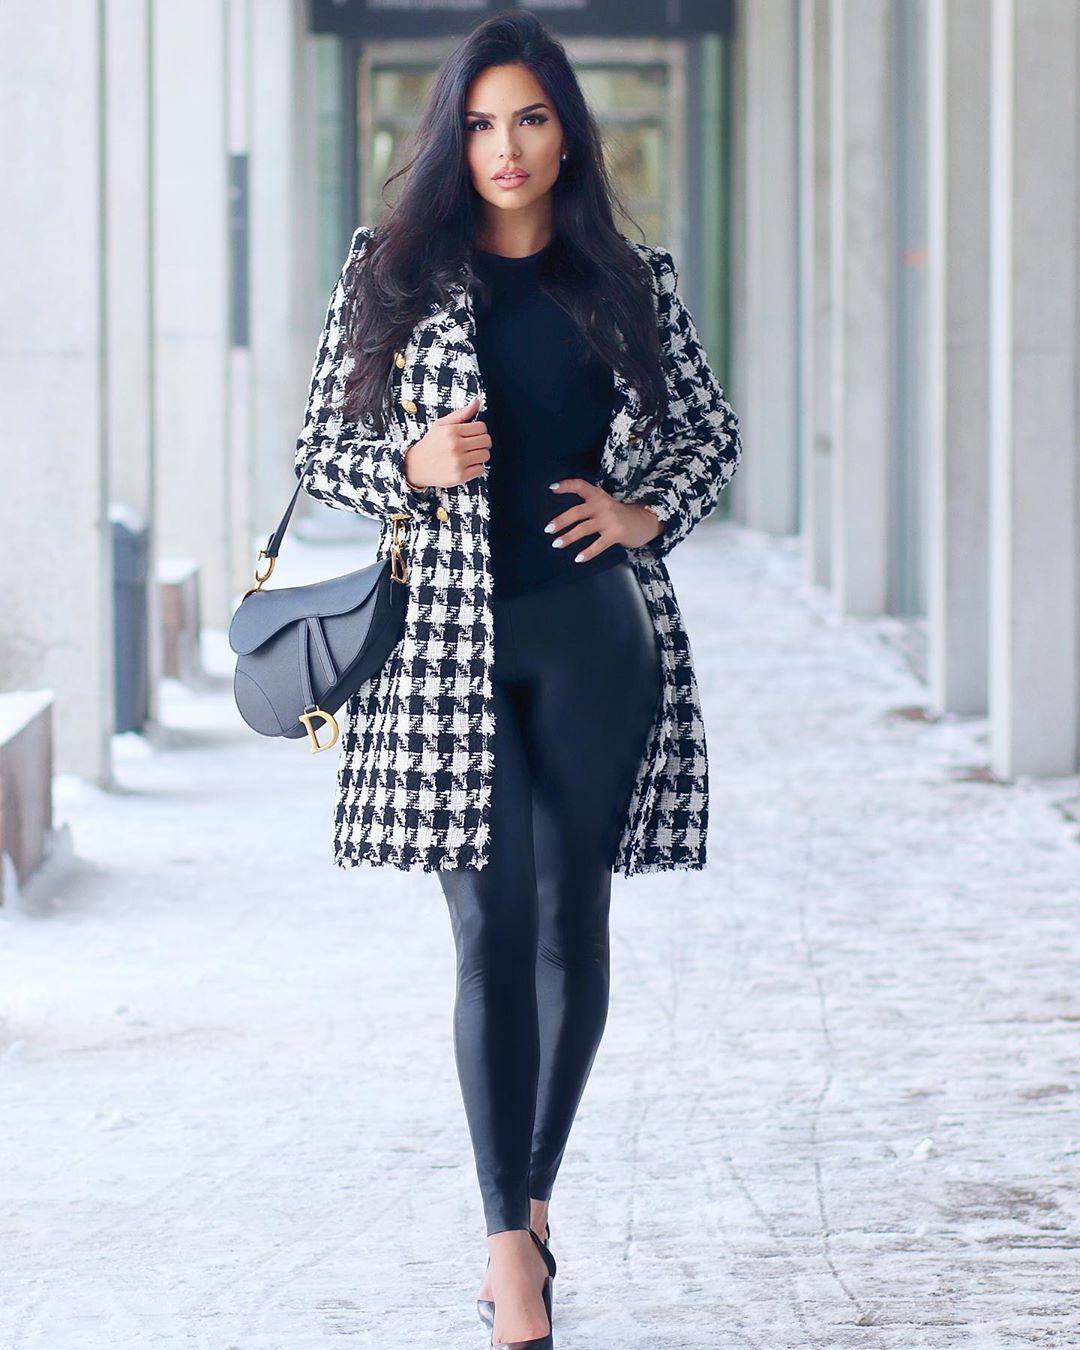 Shadi Y Cair dress coat colour outfit, shoe